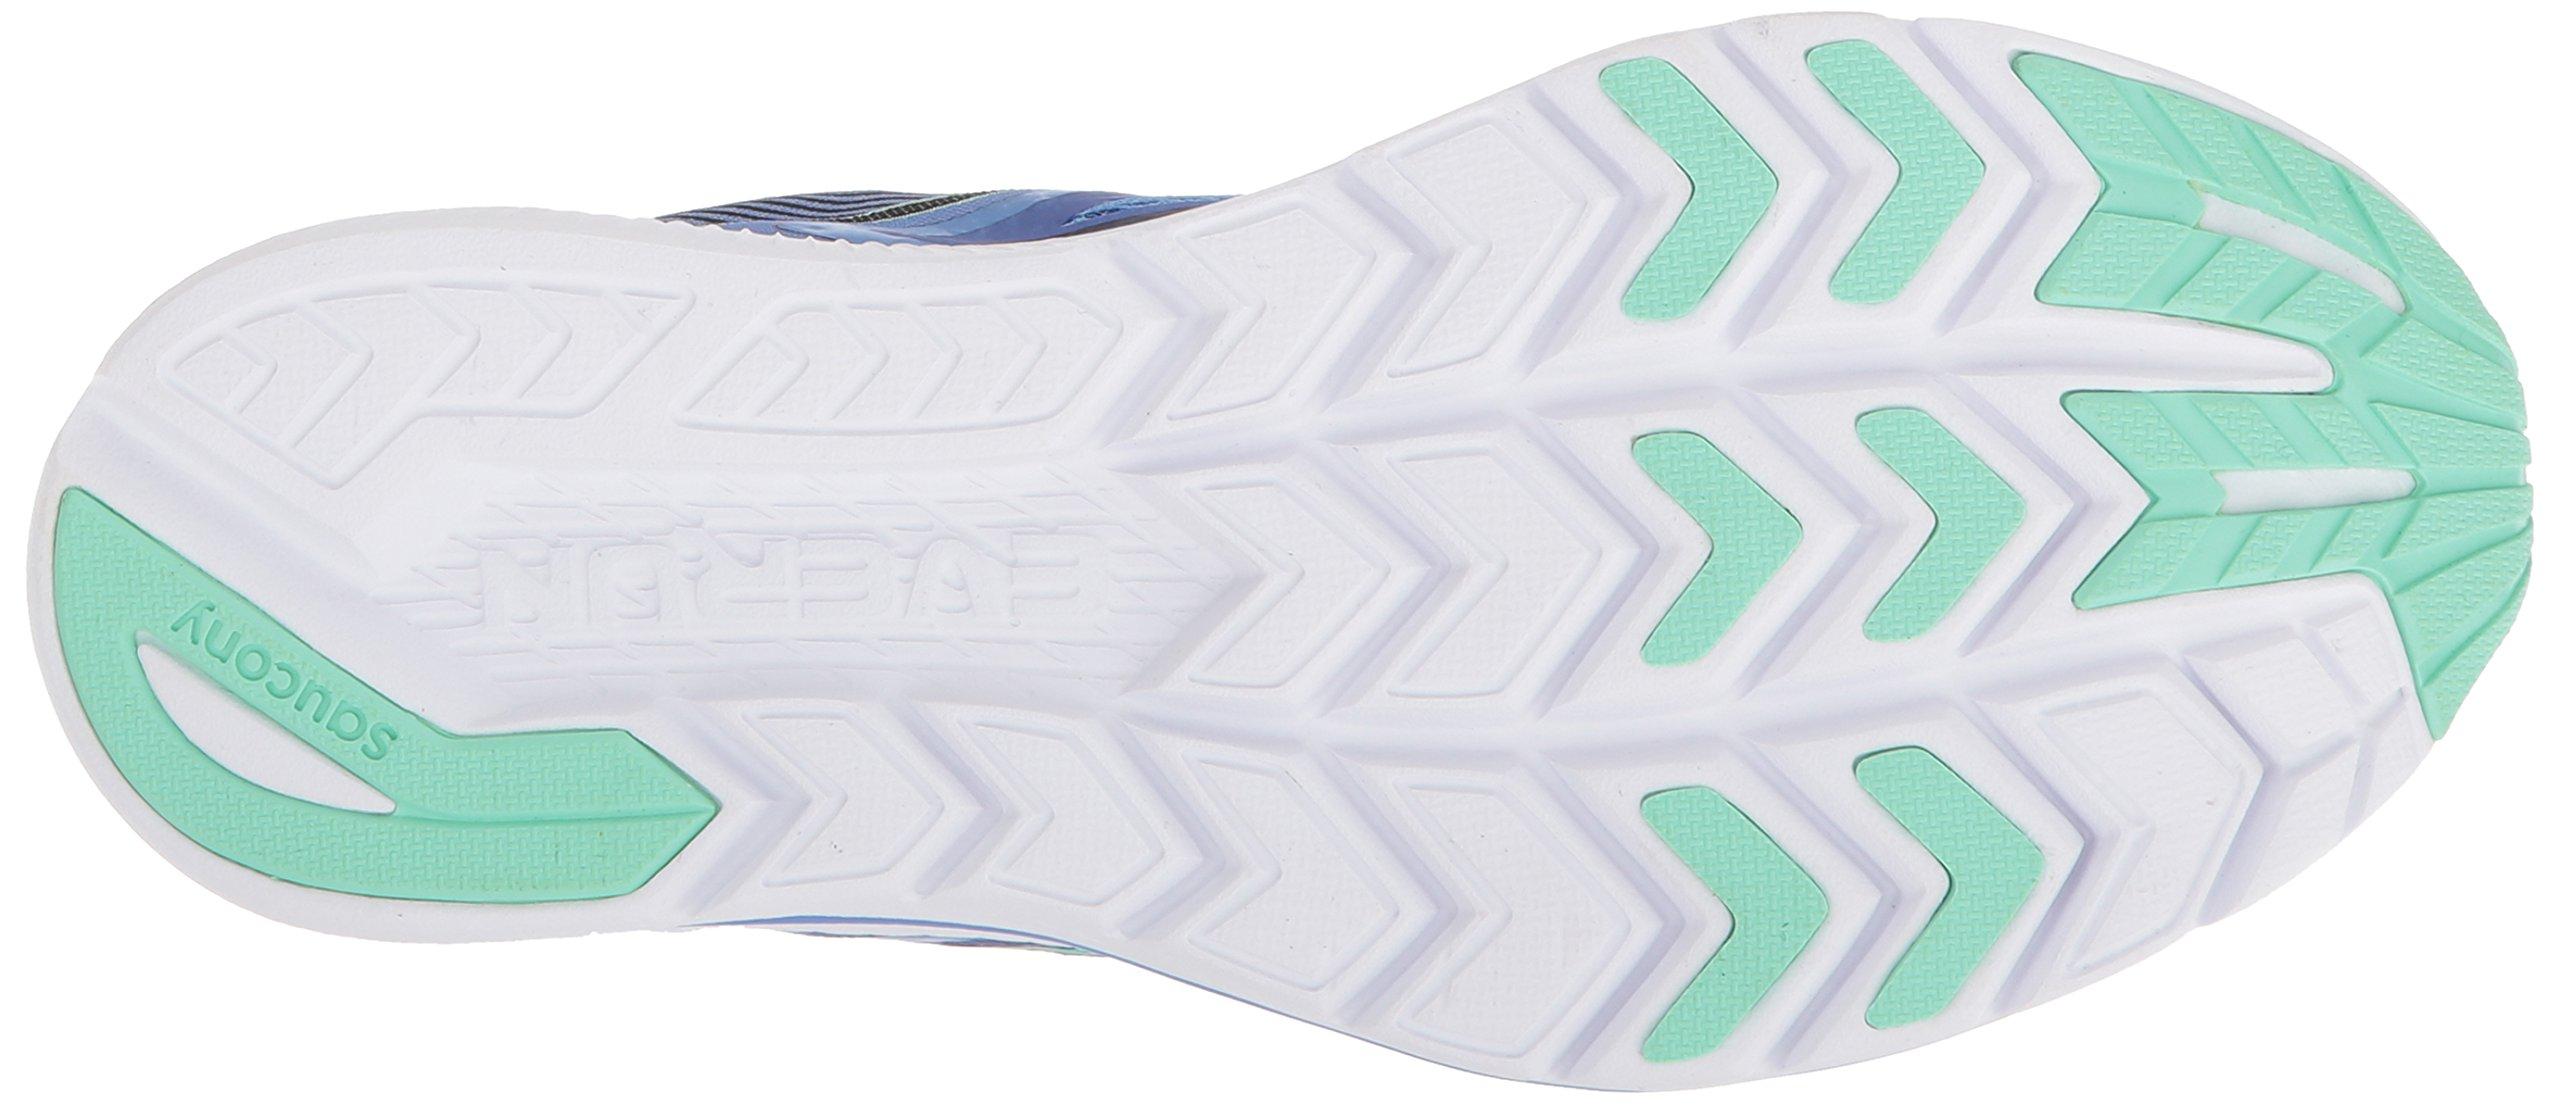 Saucony Women's Kinvara 9 Running Shoe, Blue/Teal, 9.5 Medium US by Saucony (Image #3)